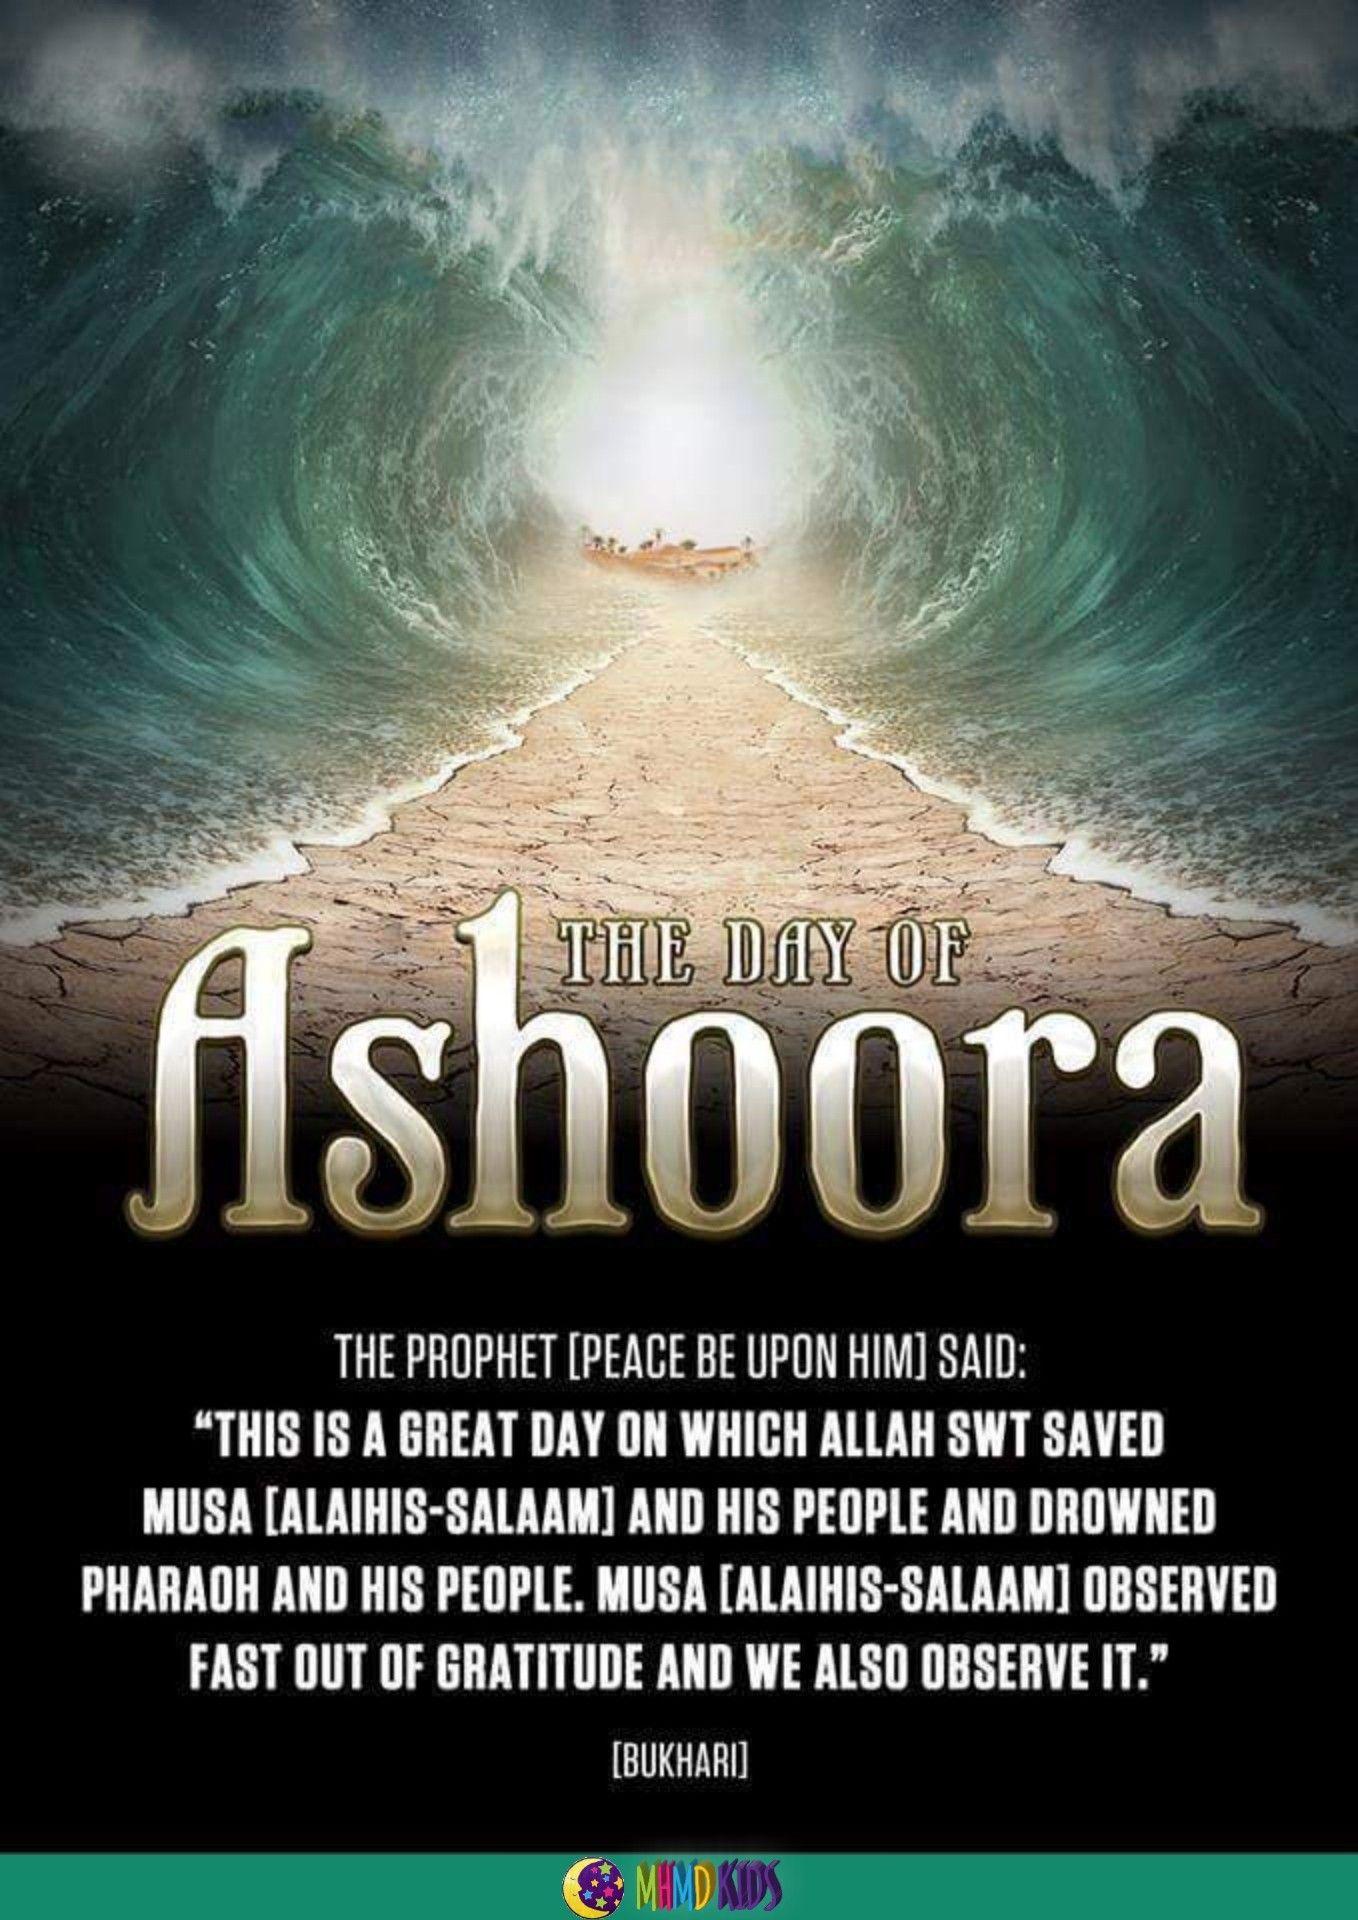 10th Muharram Ashura MHMDKIDS IslamicCalender